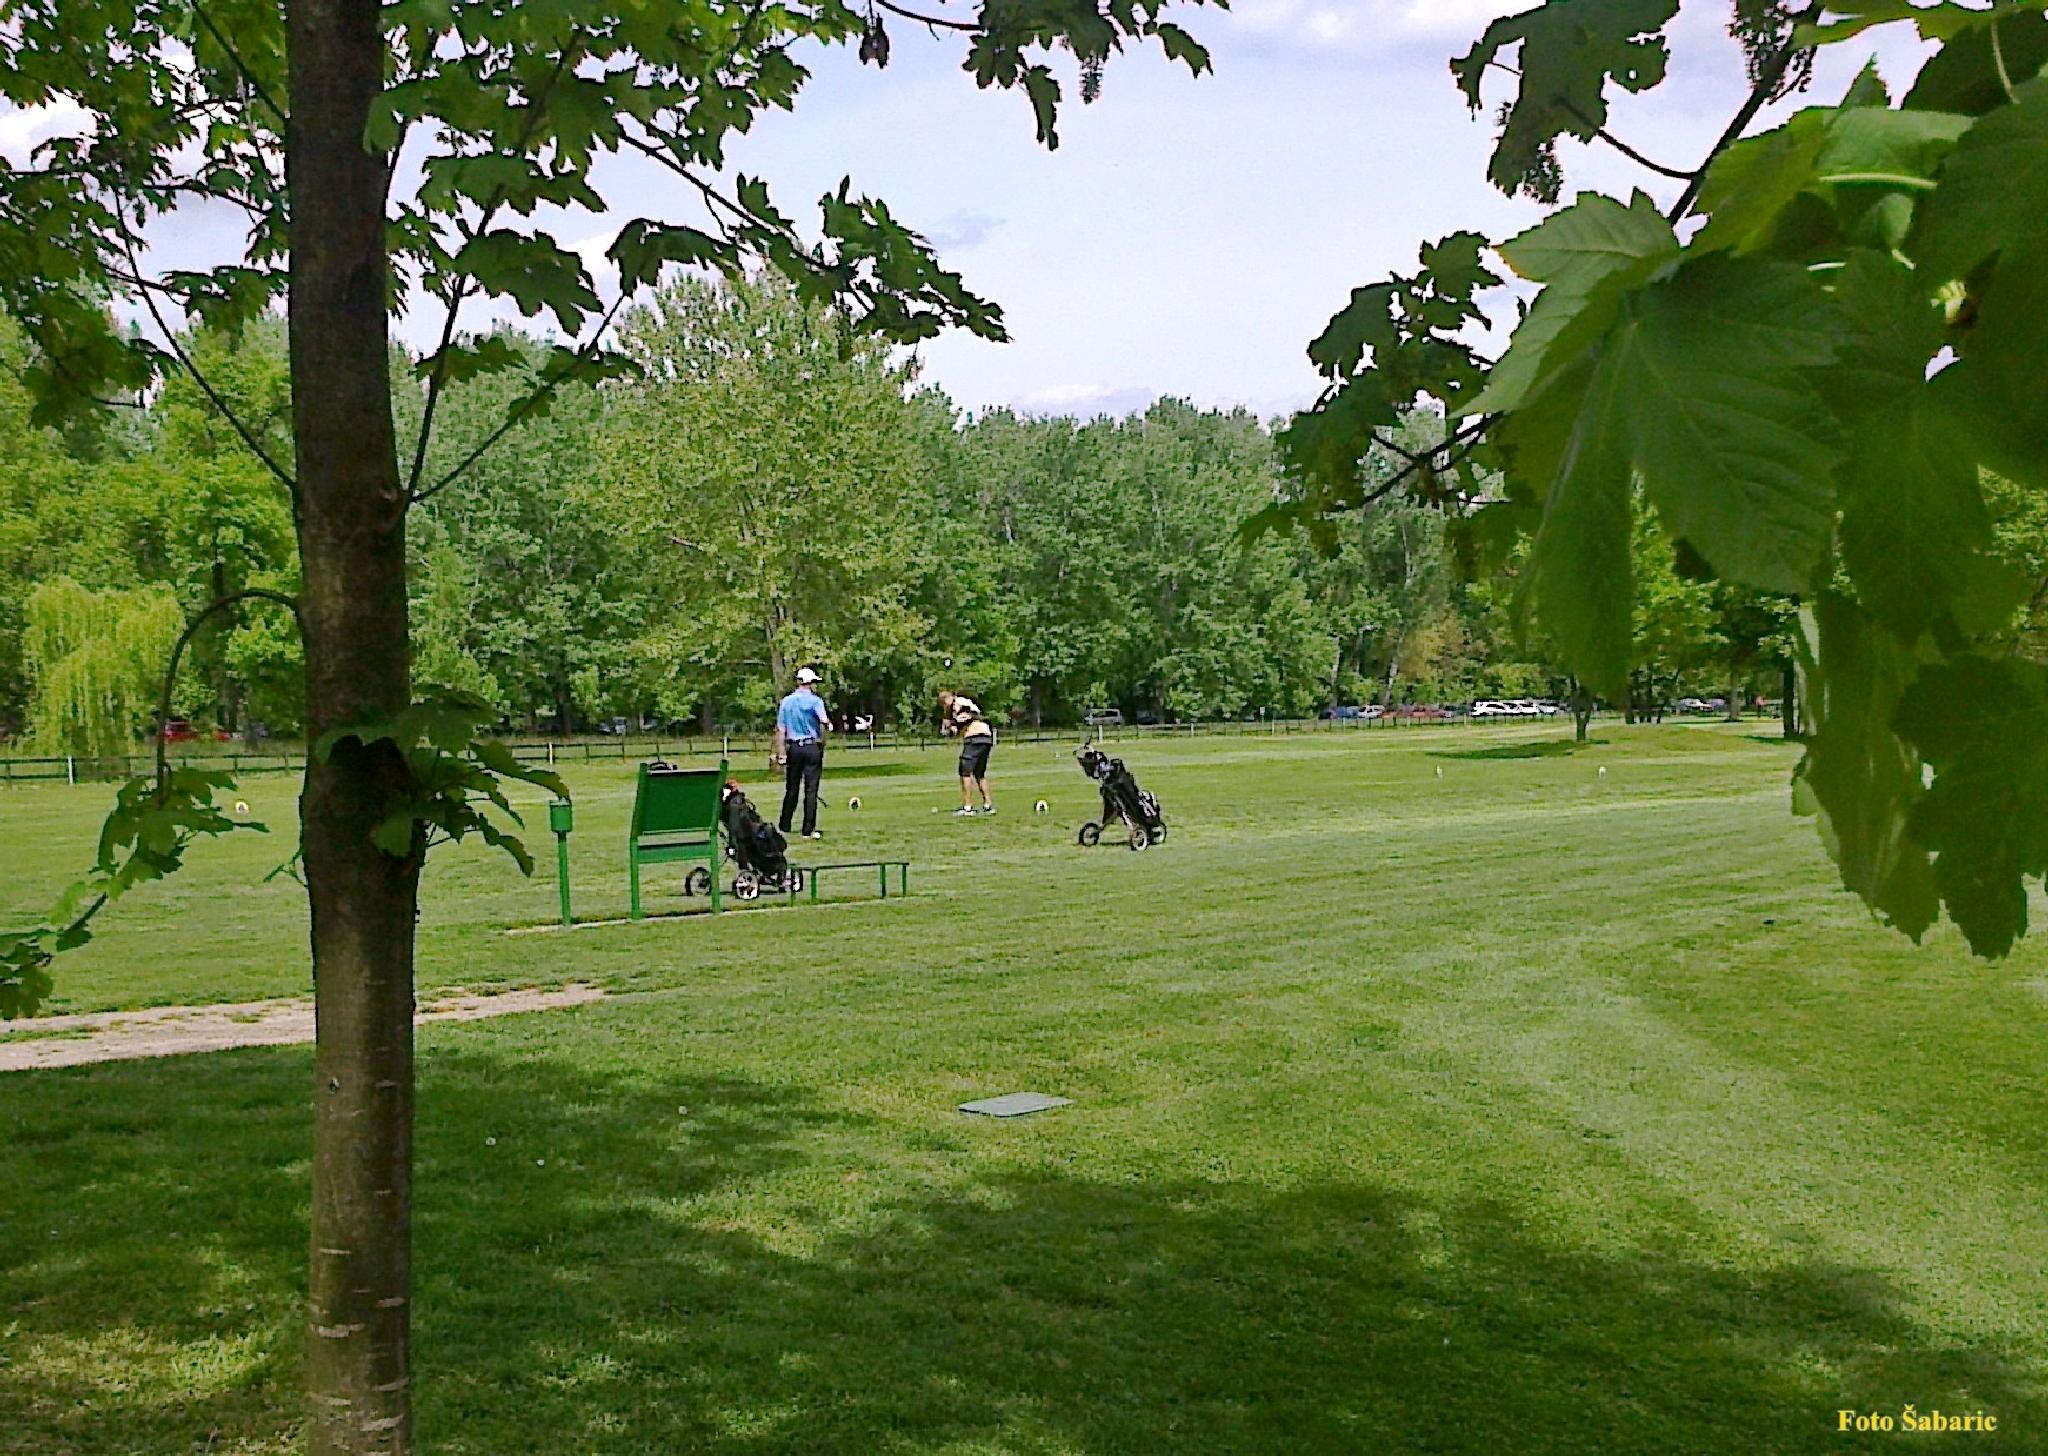 Golf courses by Dragan Šabarić